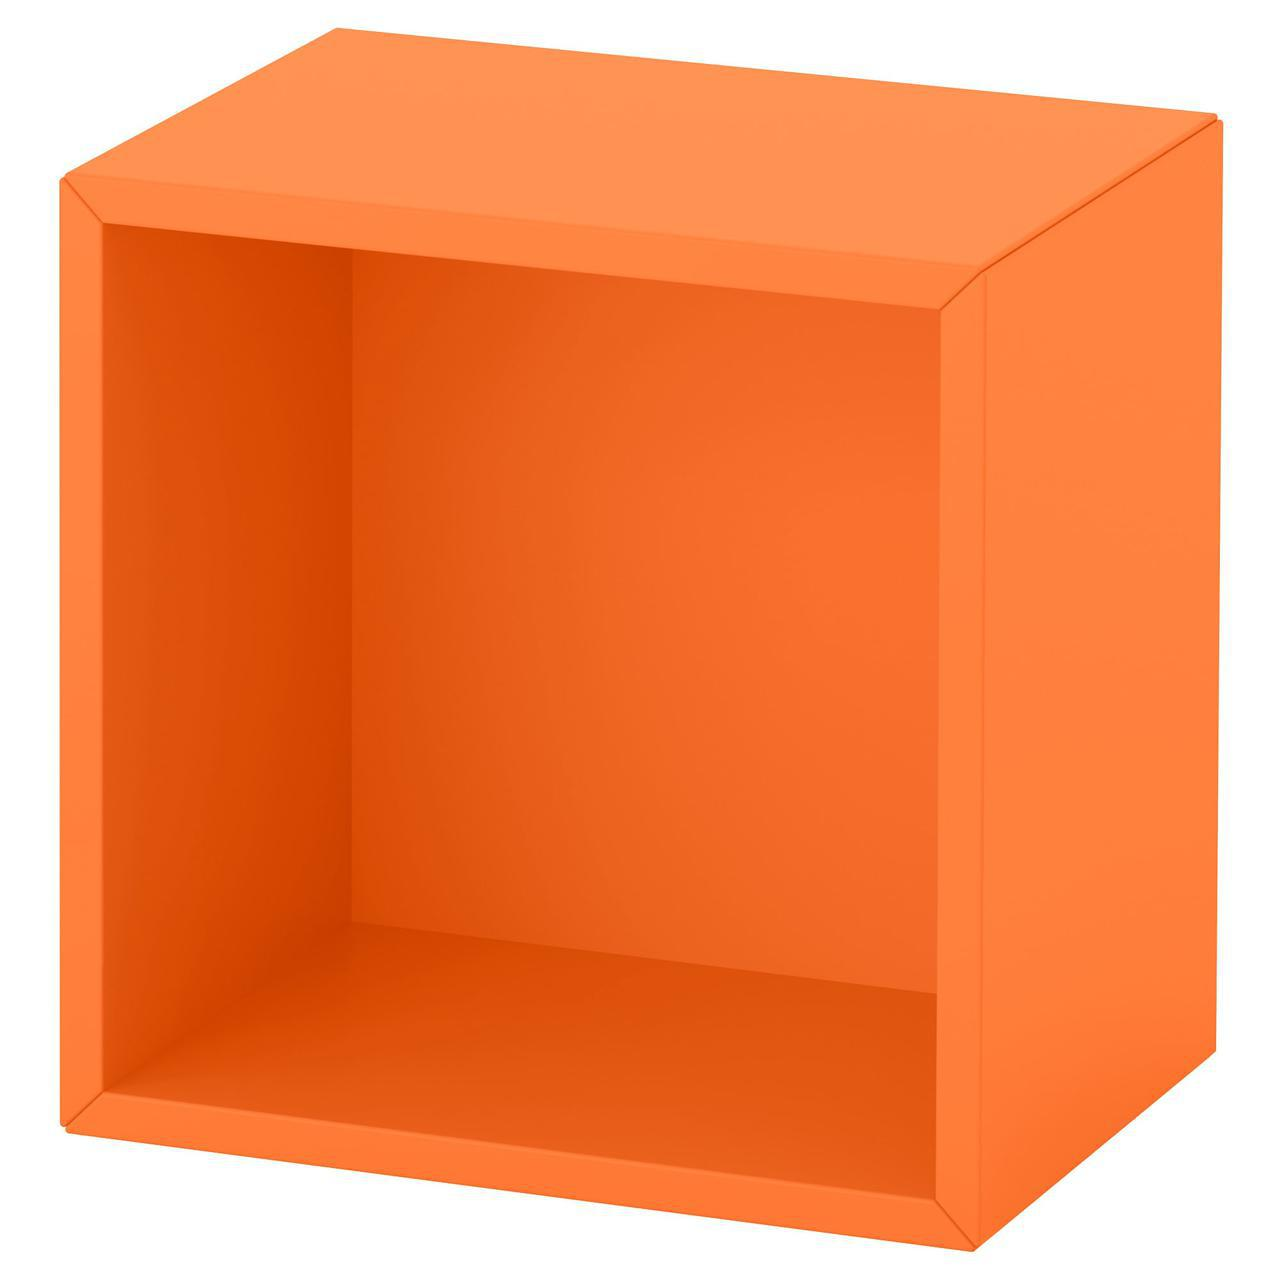 Полка настенная IKEA EKET 35x25x35 см оранжевая 092.858.76